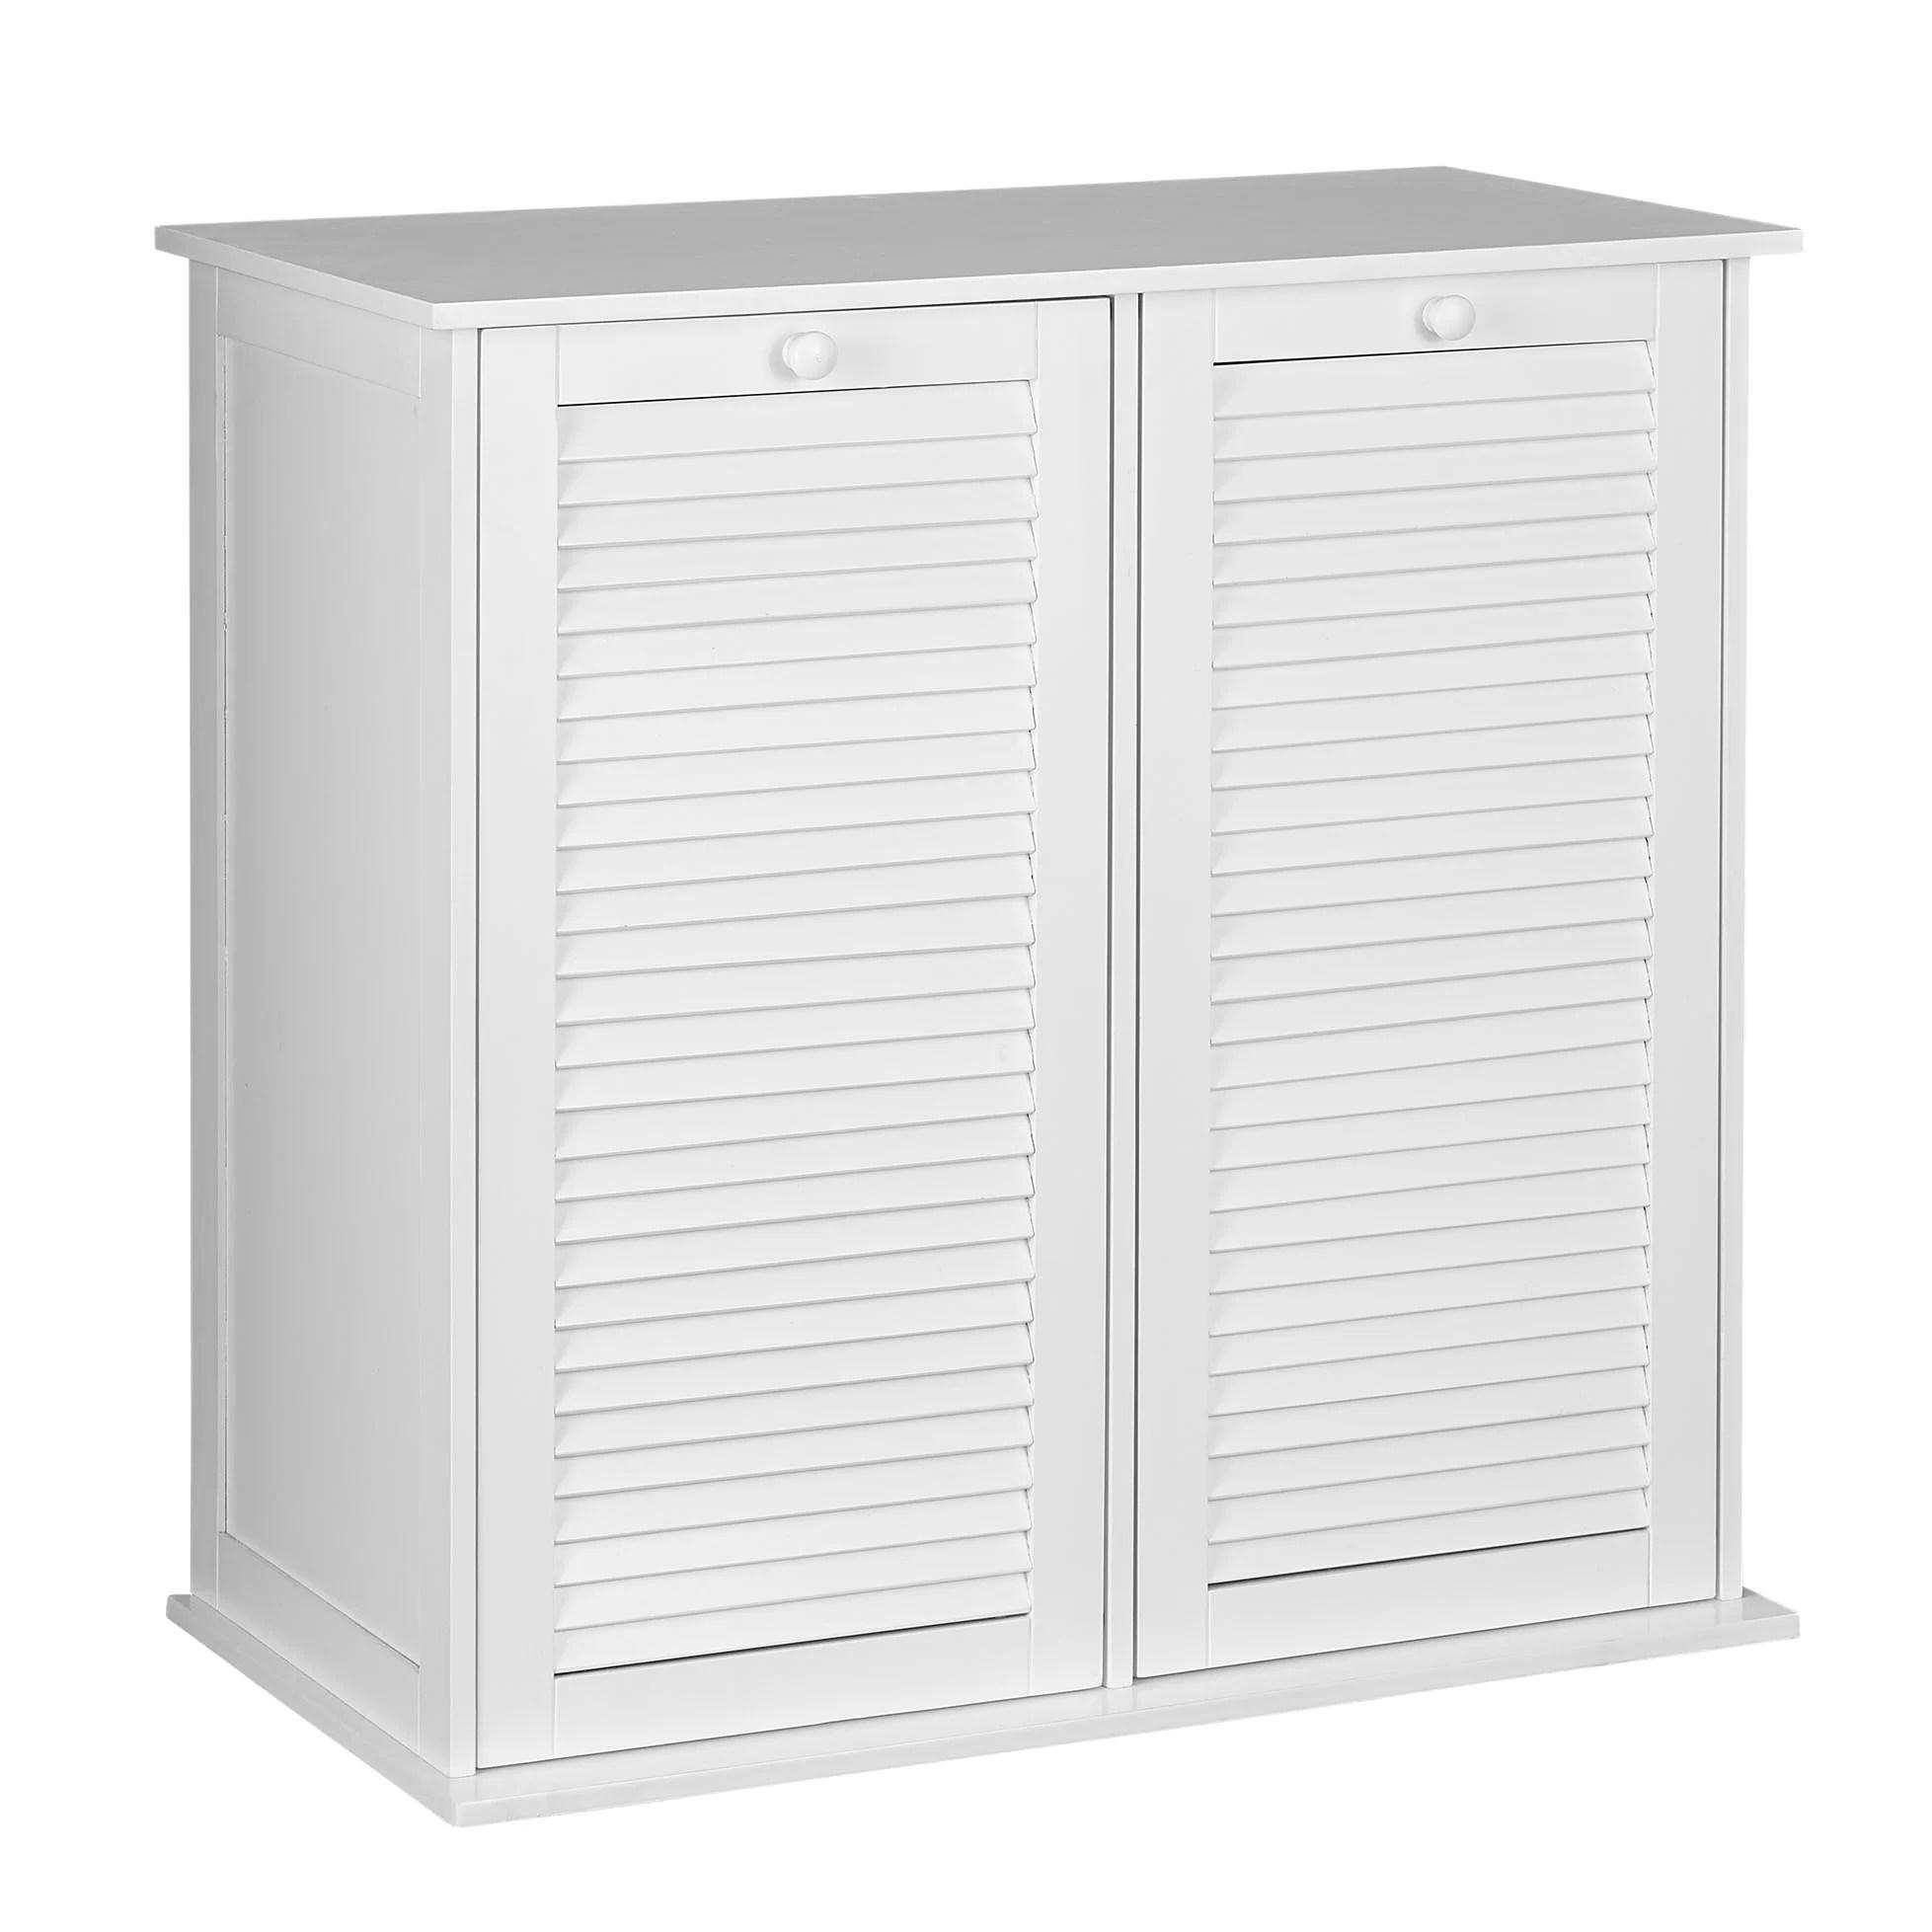 Household Essentials Cabinet Laundry Hamper  Reviews  Wayfair